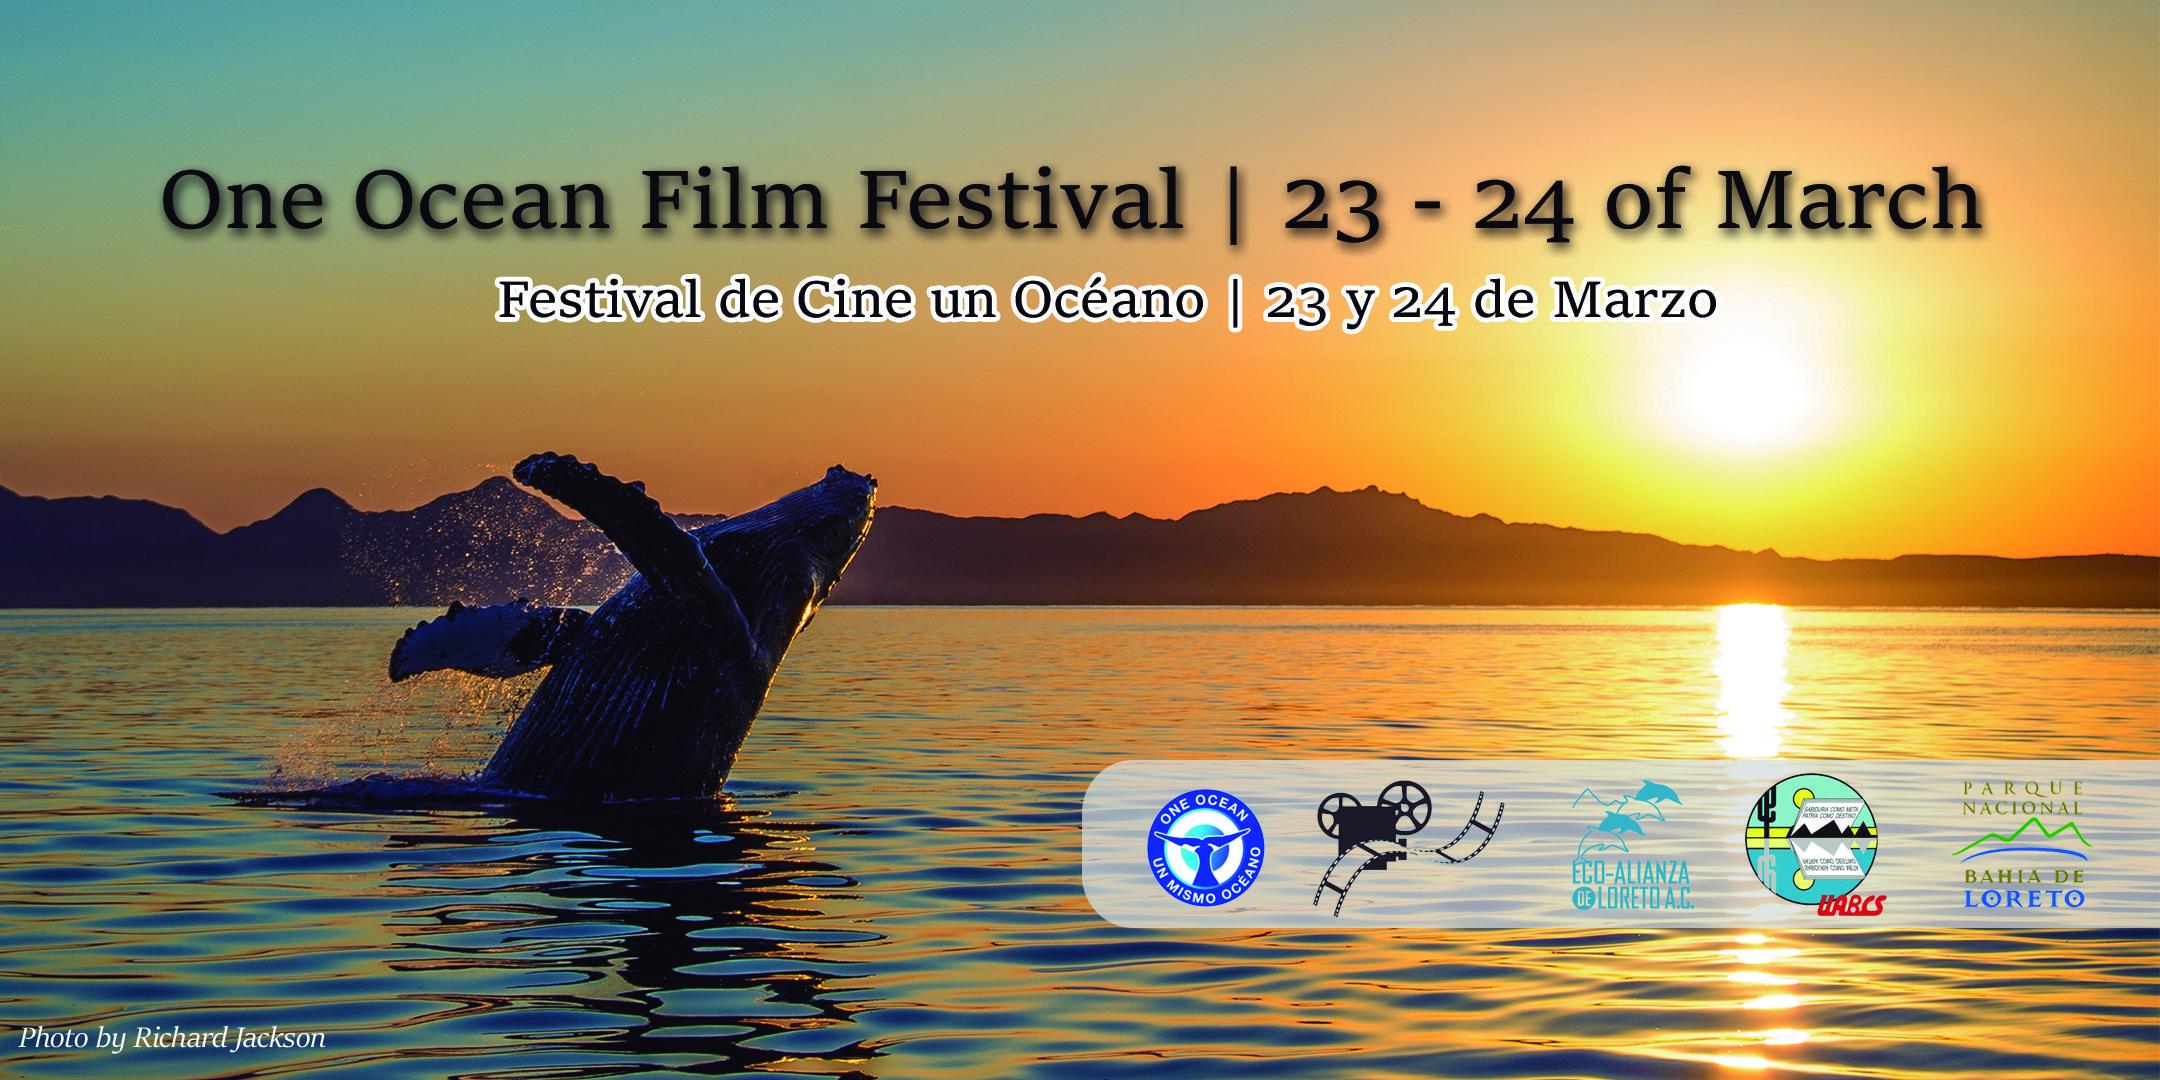 One Ocean Film Festival / Festival de Cine Un Océano